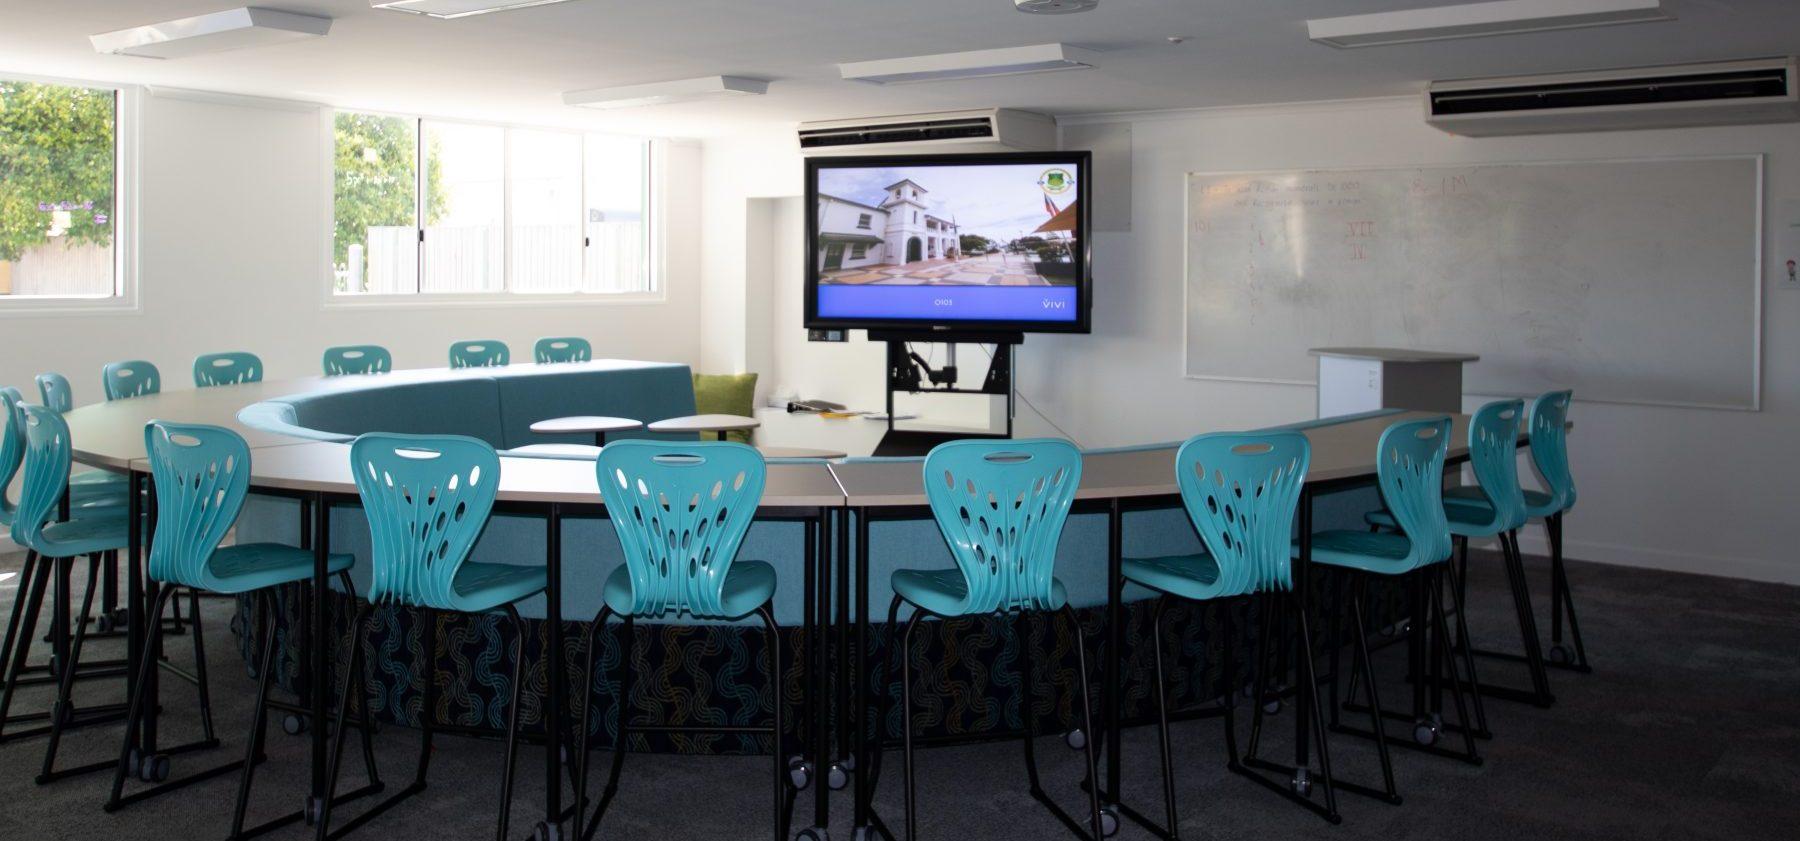 St Patricks College Interior Learning Centre